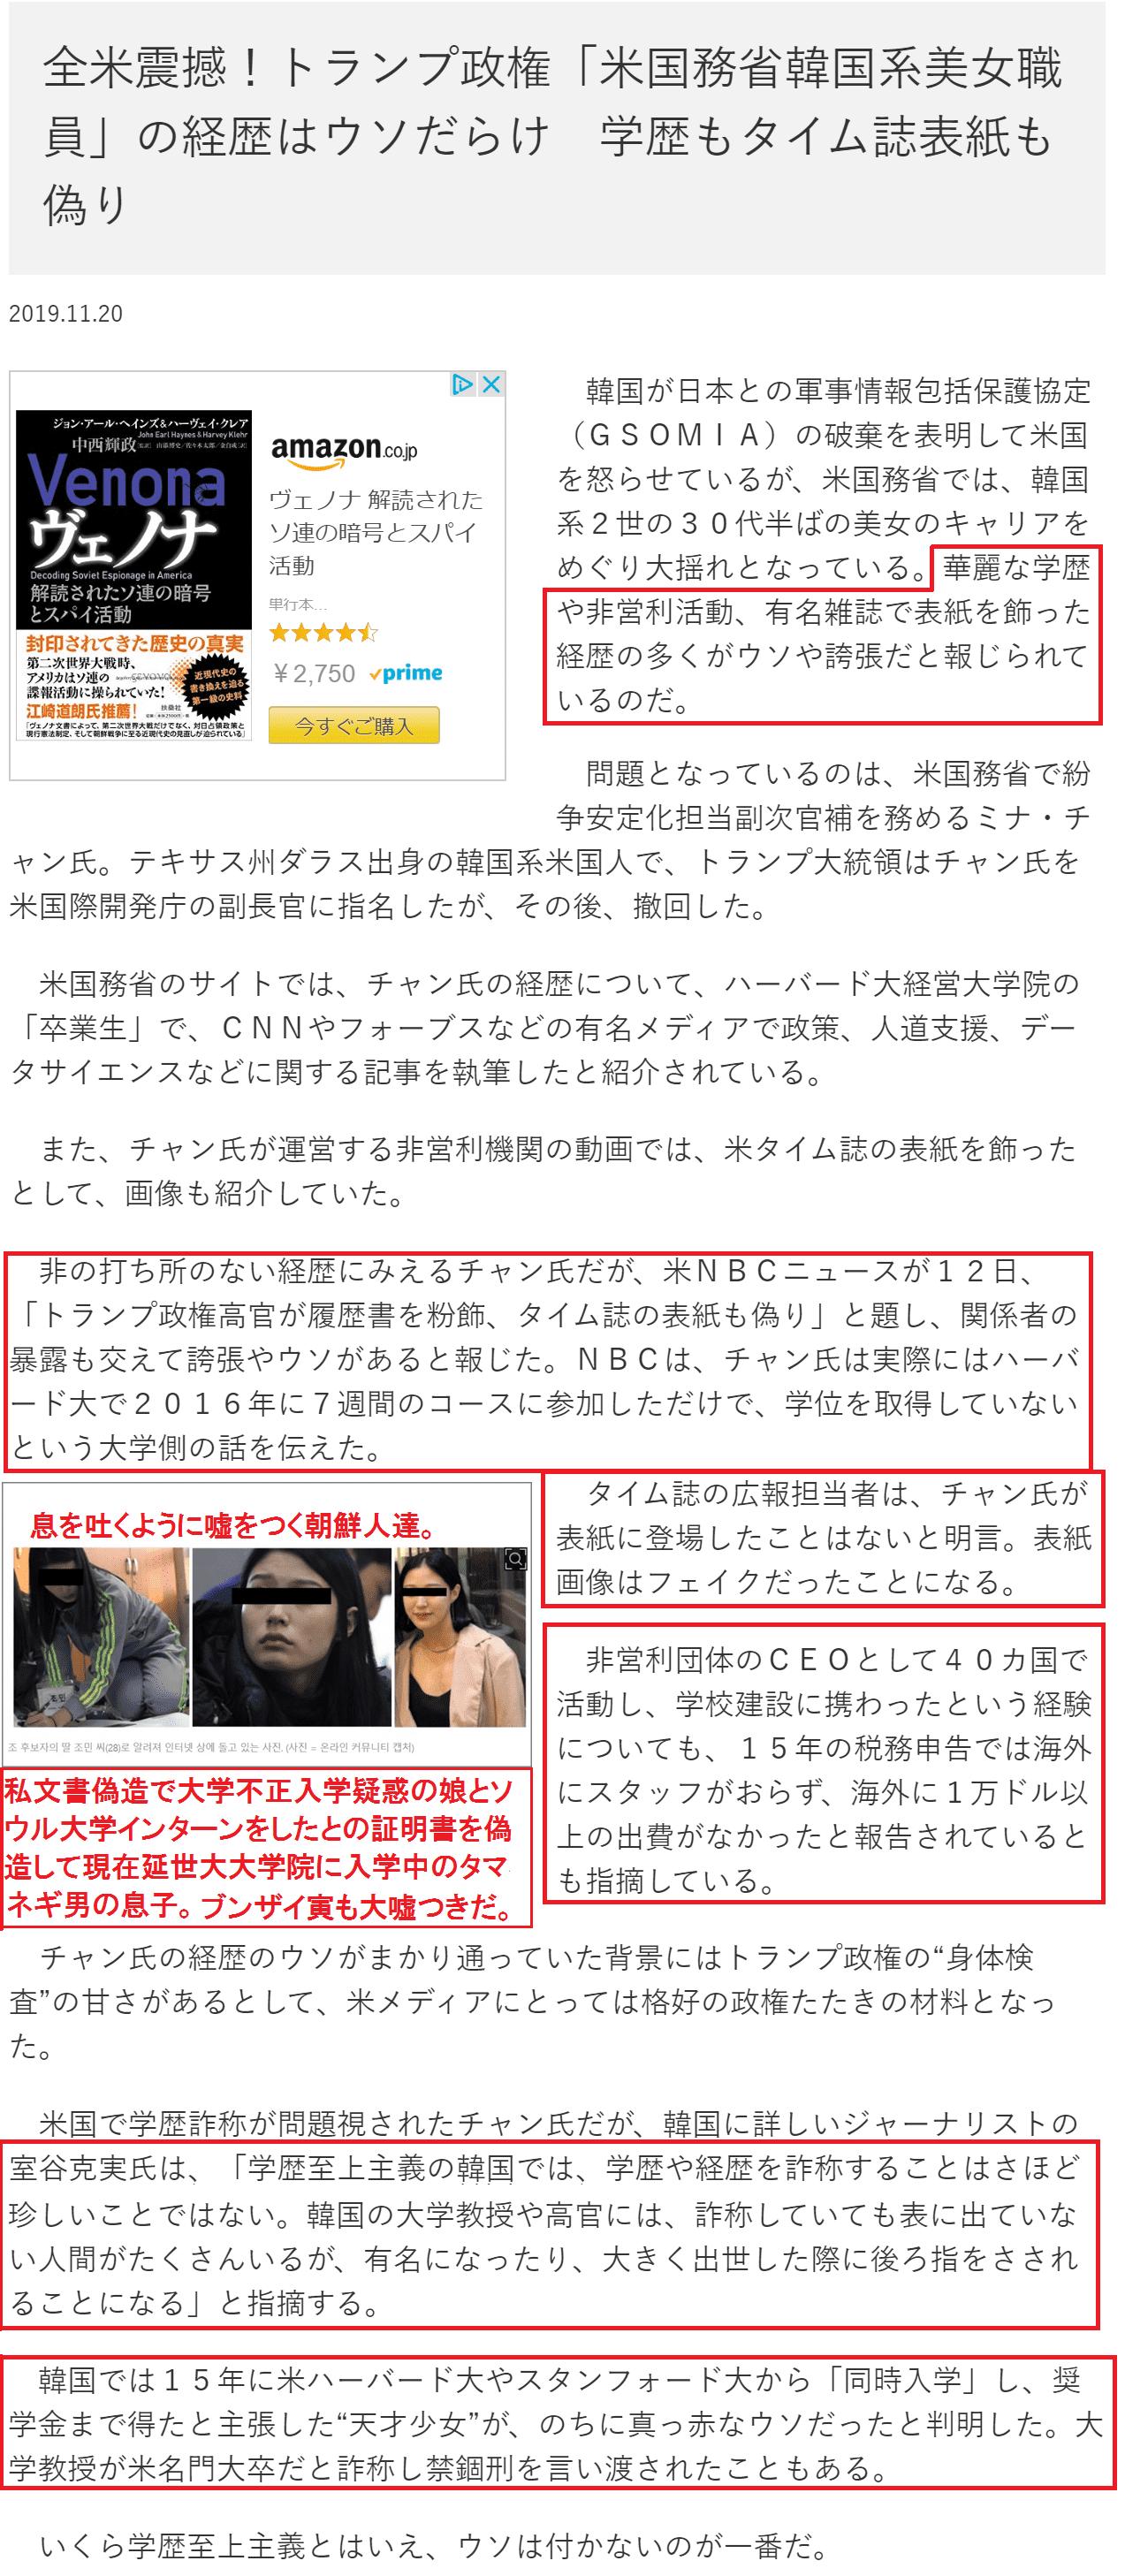 NHKが報じないトランプ政権の経歴詐欺の朝鮮系米国人